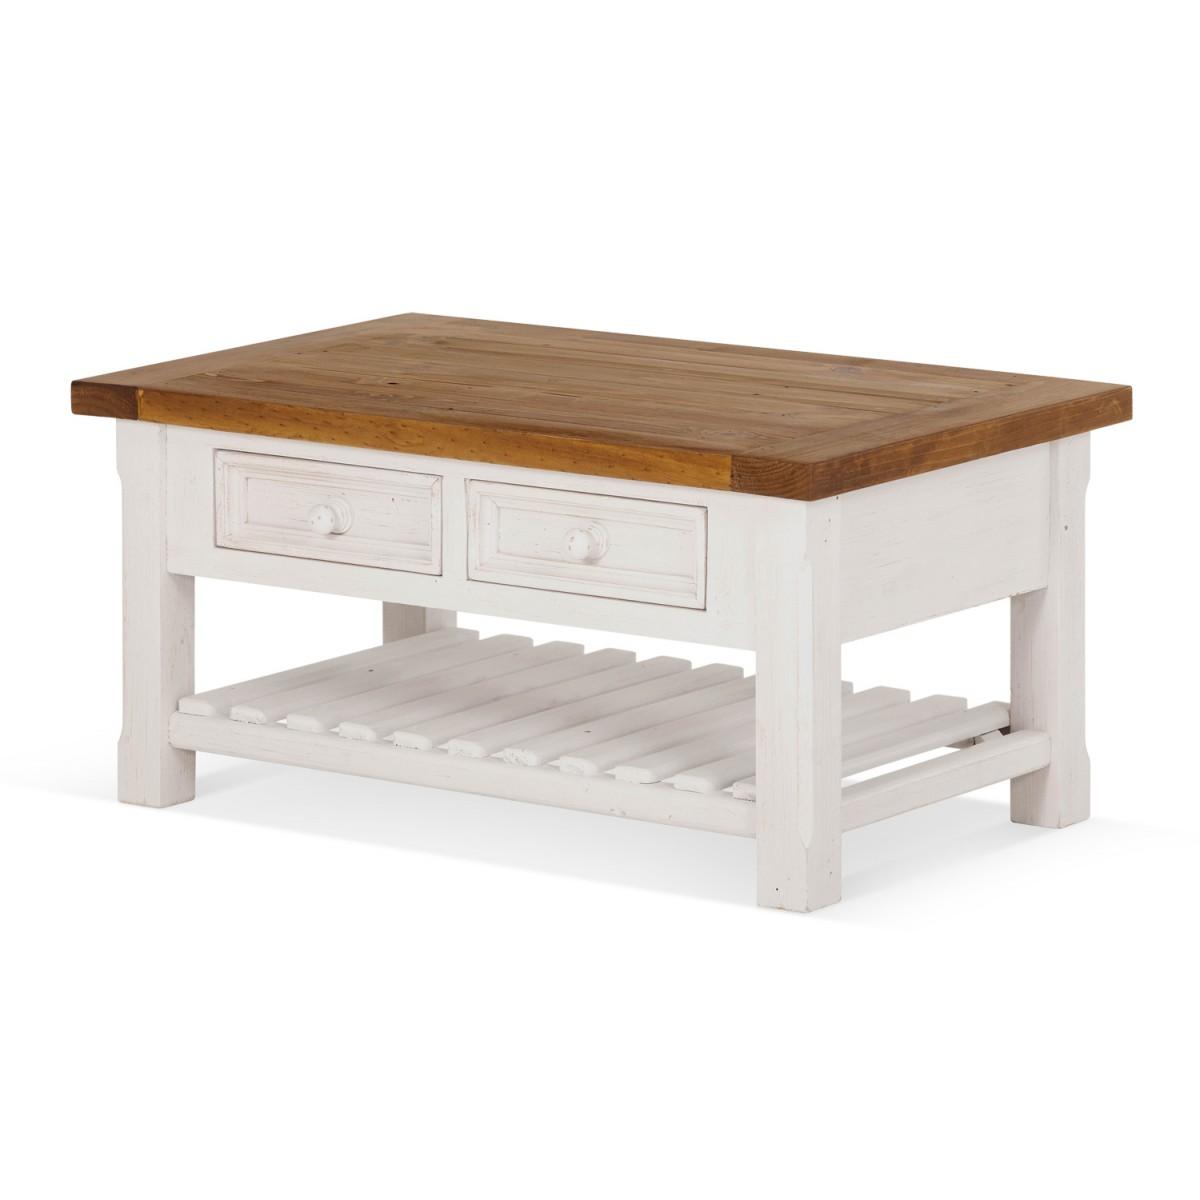 Table basse 2 Tiroirs Bois Blanc 90x55x43cm